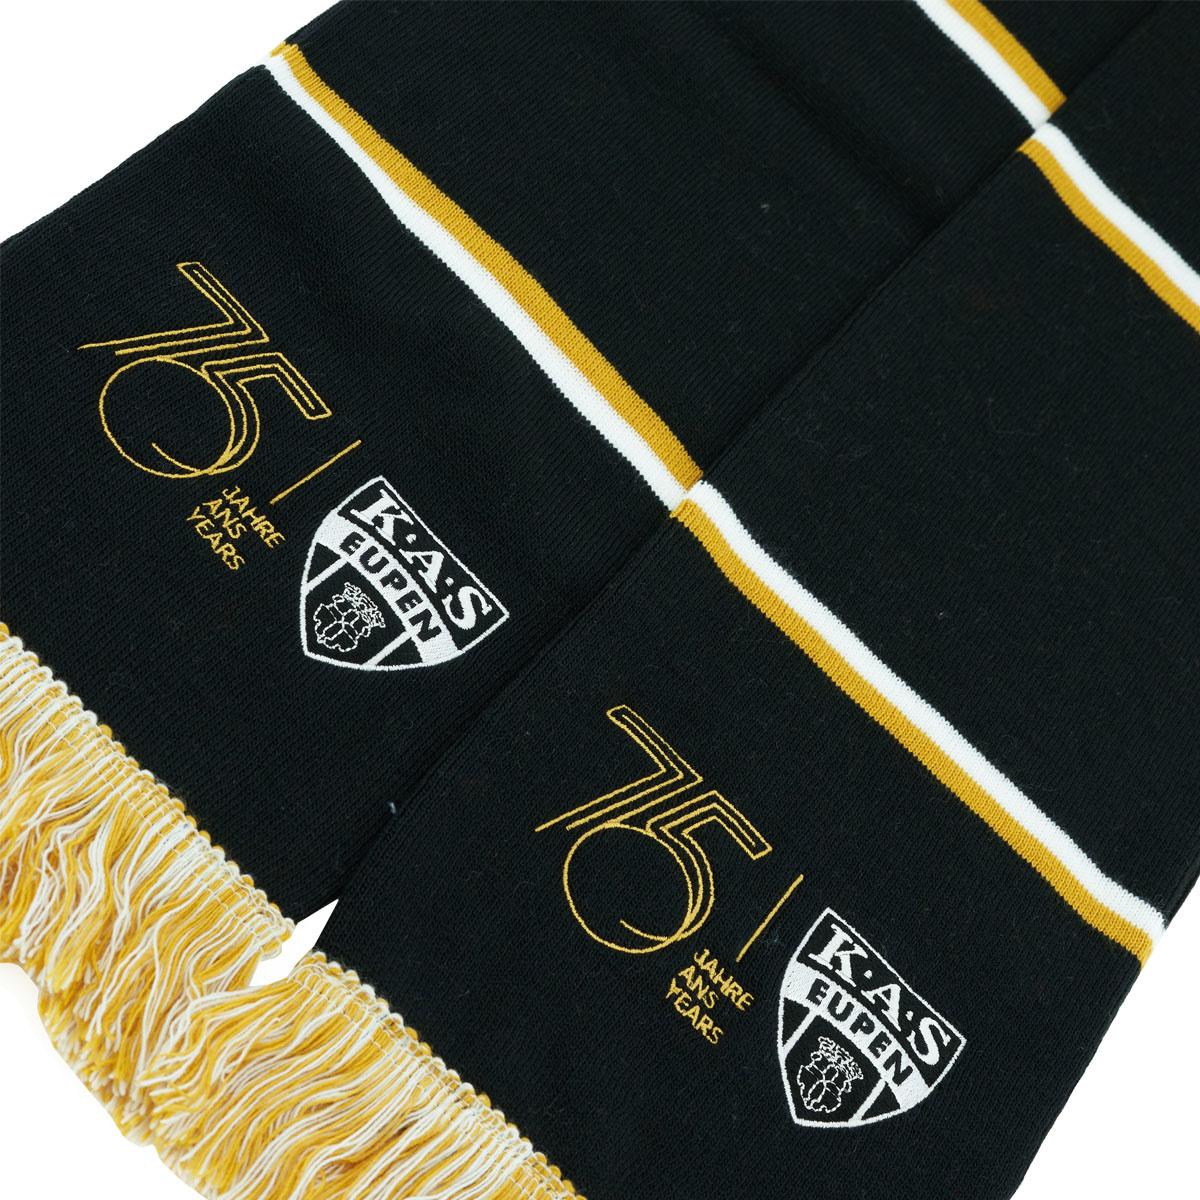 Topfanz Bar scarf black 75 logo